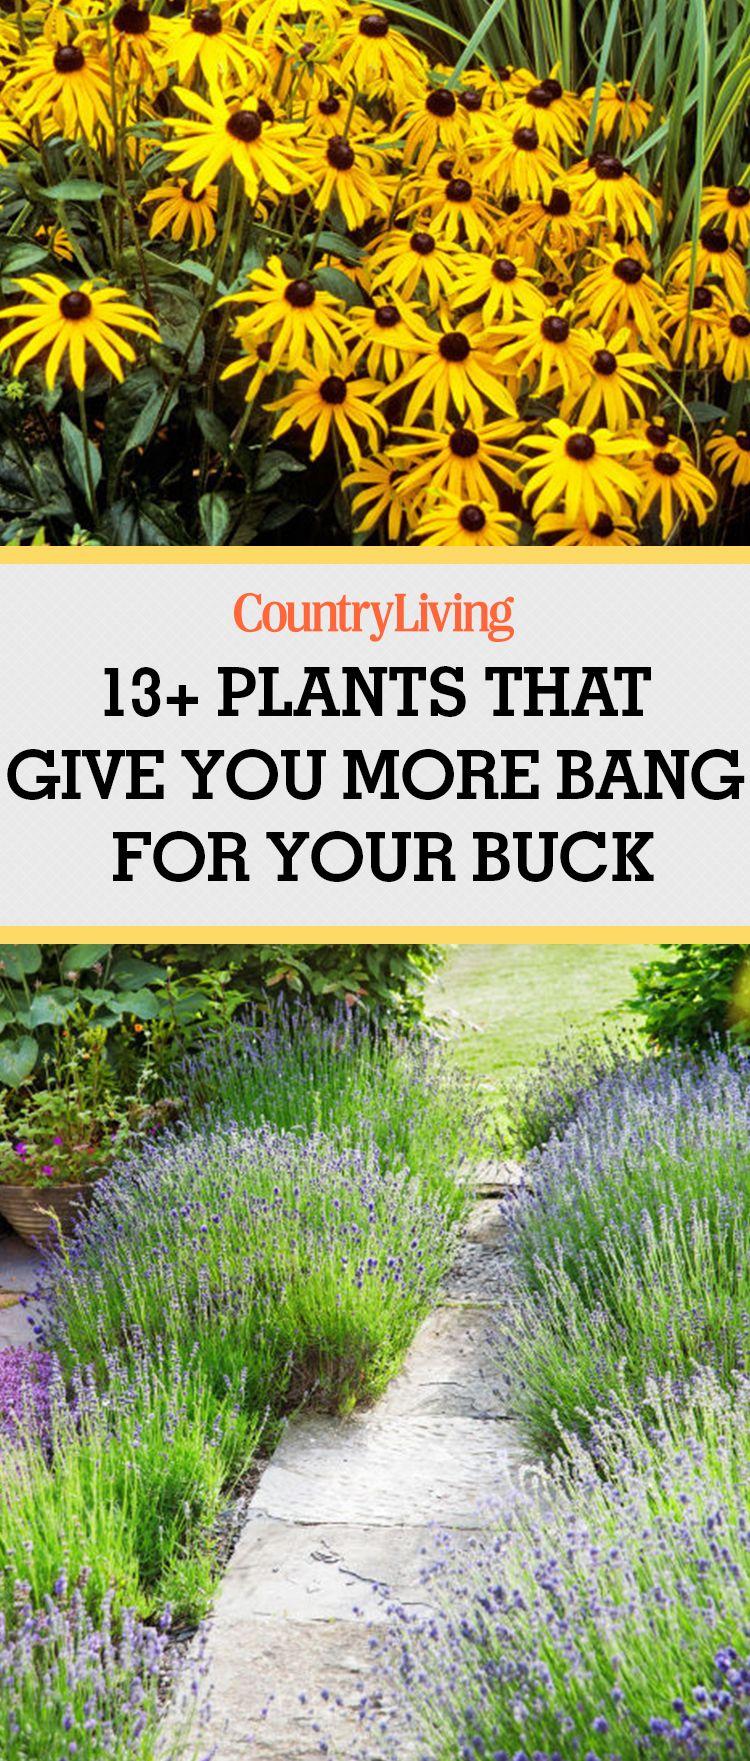 15 Easy Garden Plants To Grow - Cheap Hardy Plant Ideas